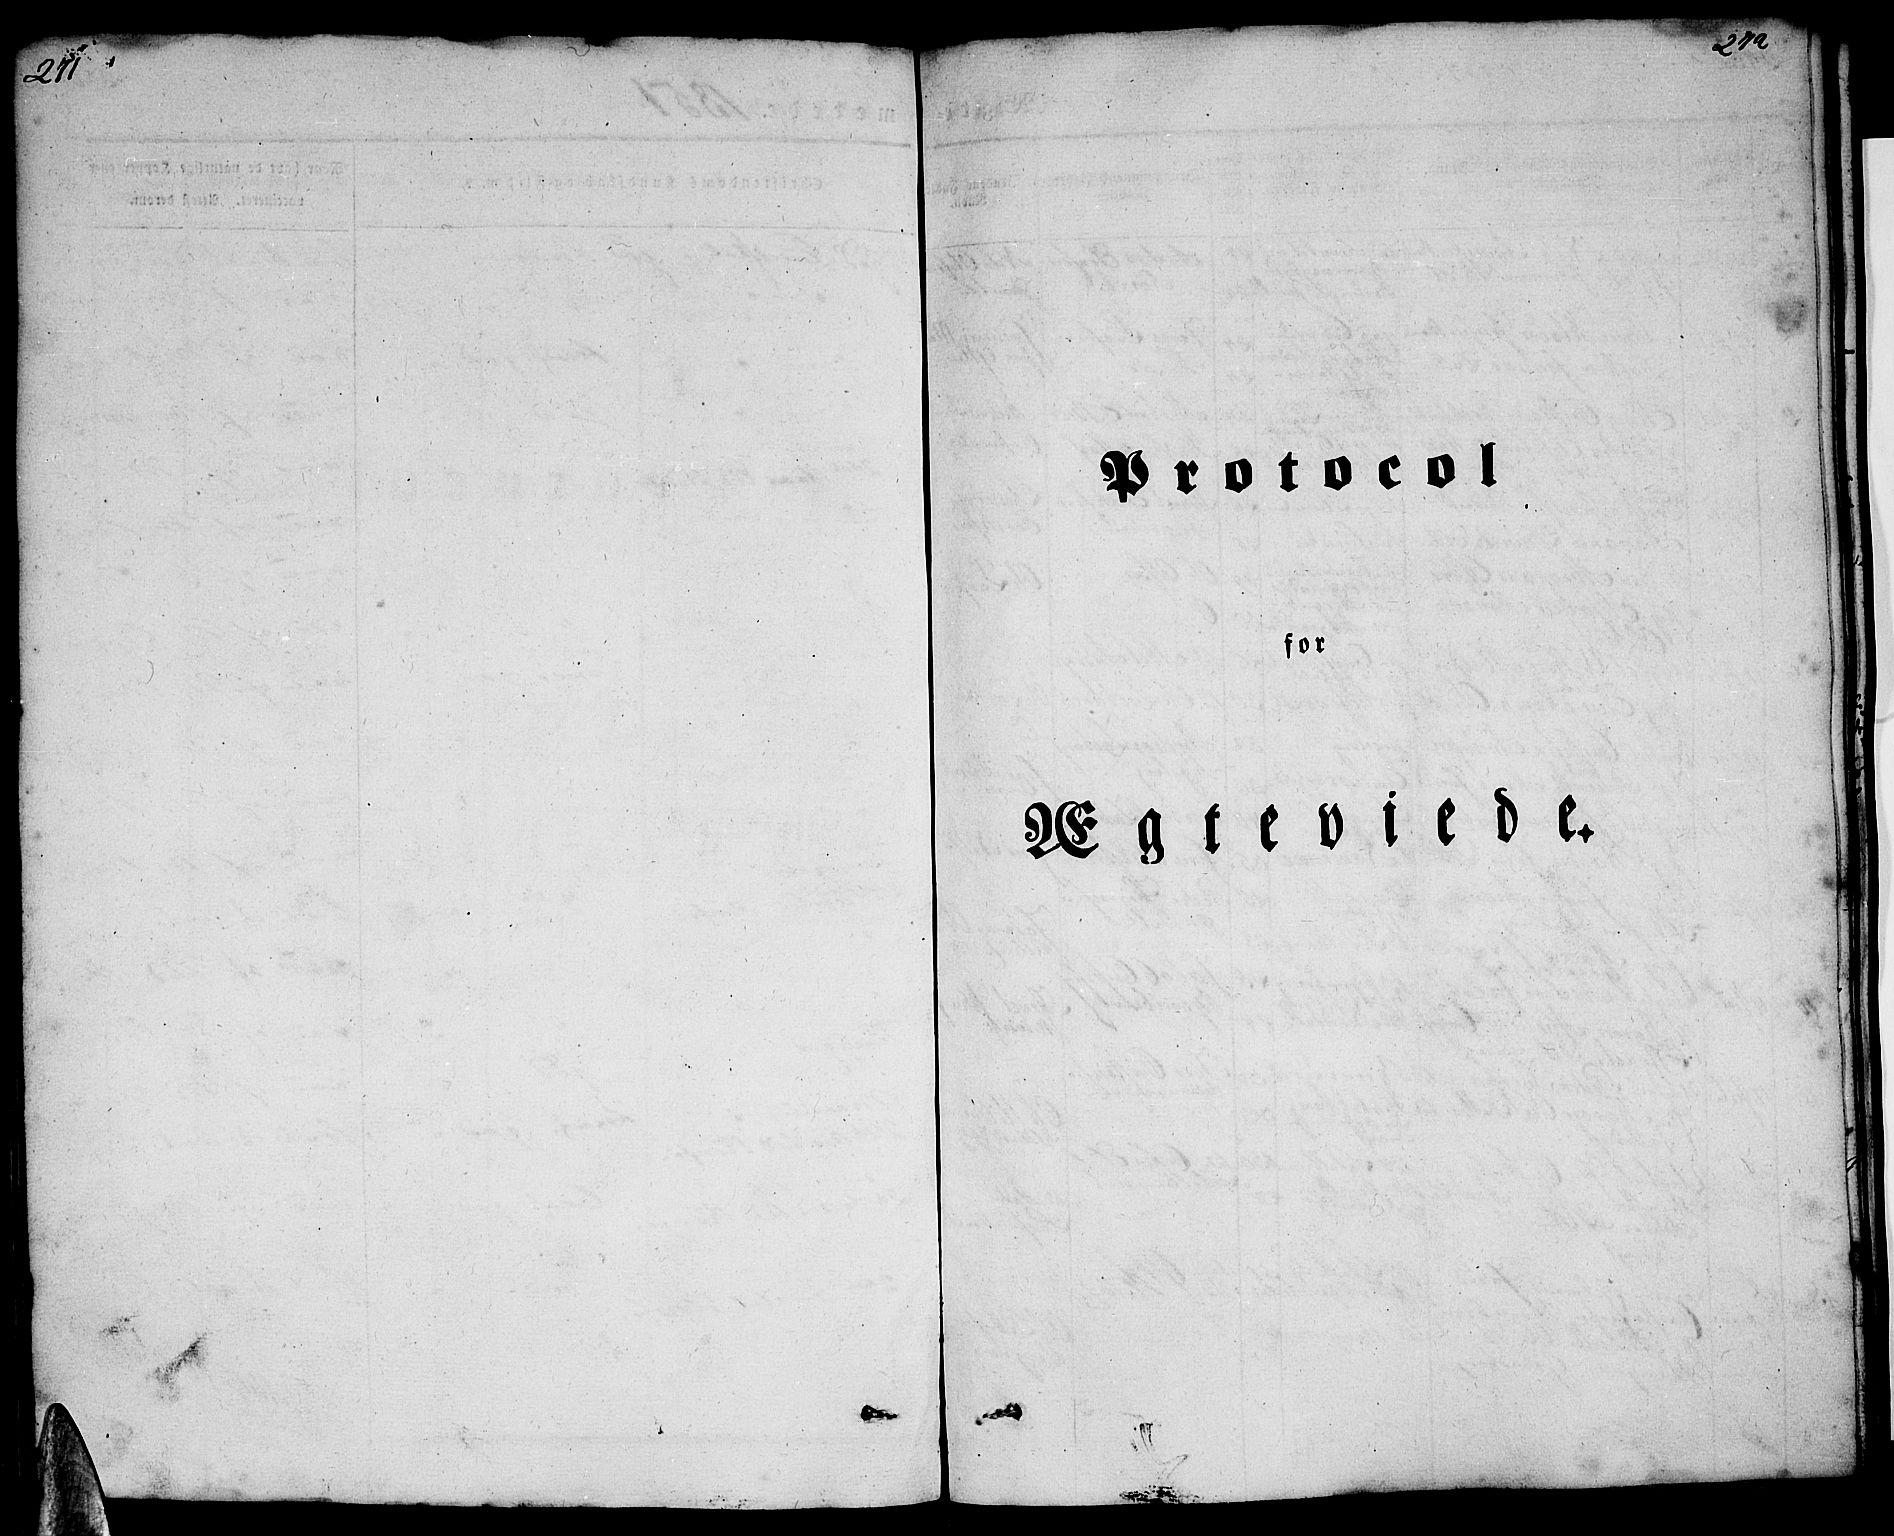 SAT, Ministerialprotokoller, klokkerbøker og fødselsregistre - Nordland, 827/L0413: Klokkerbok nr. 827C02, 1842-1852, s. 271-272